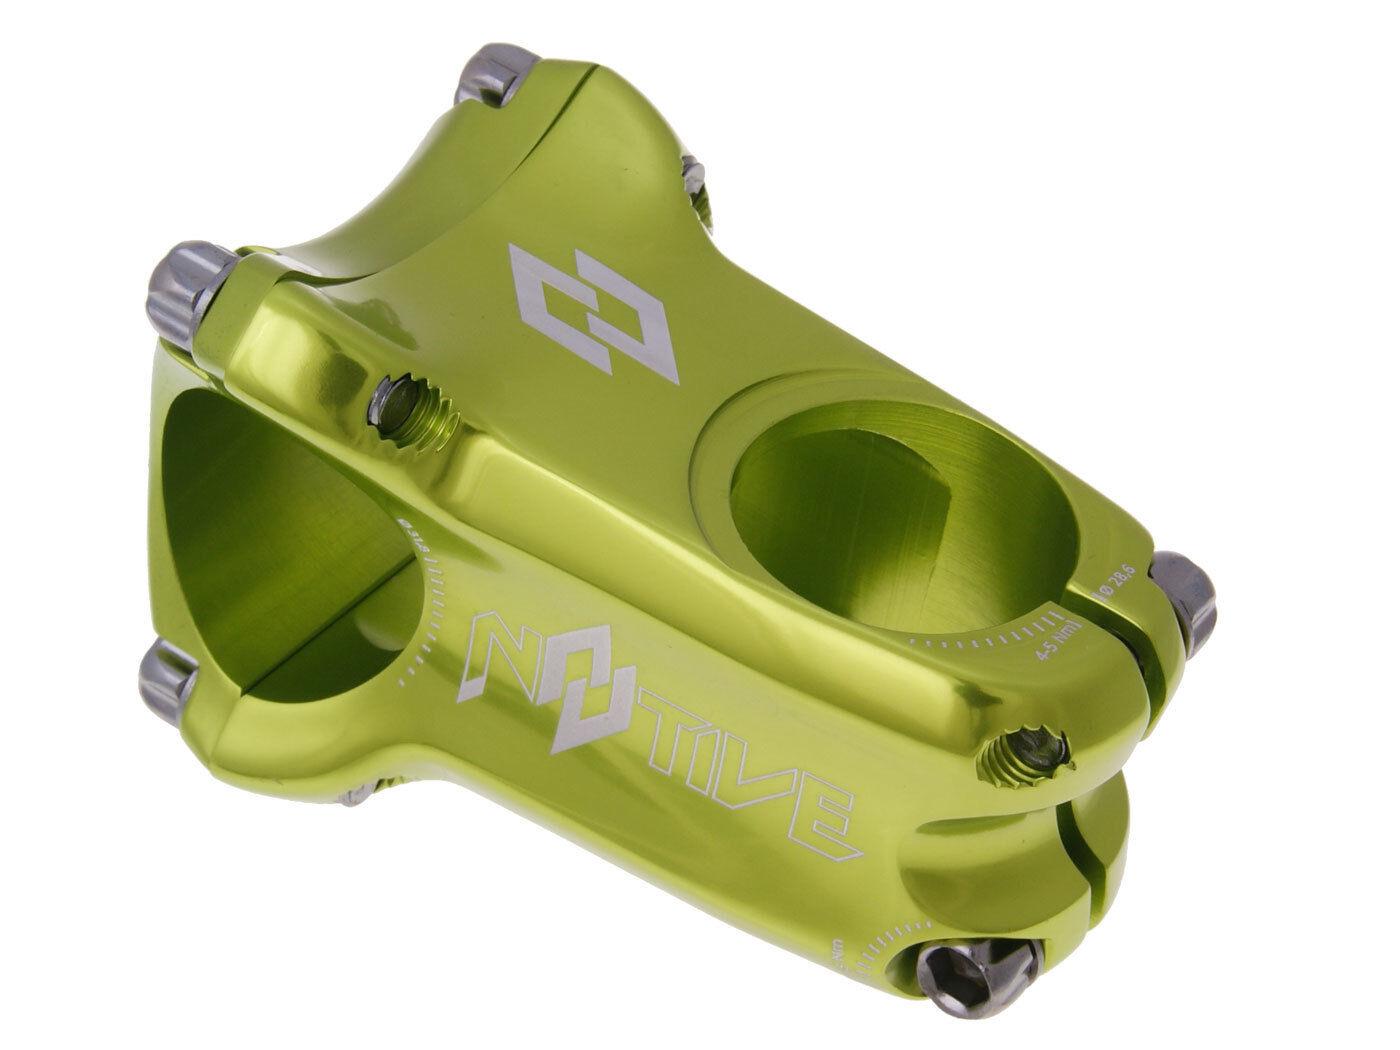 N 8 tive Enduro Stem Aluminium MTB Downhill Enduro Fahrrad Grün